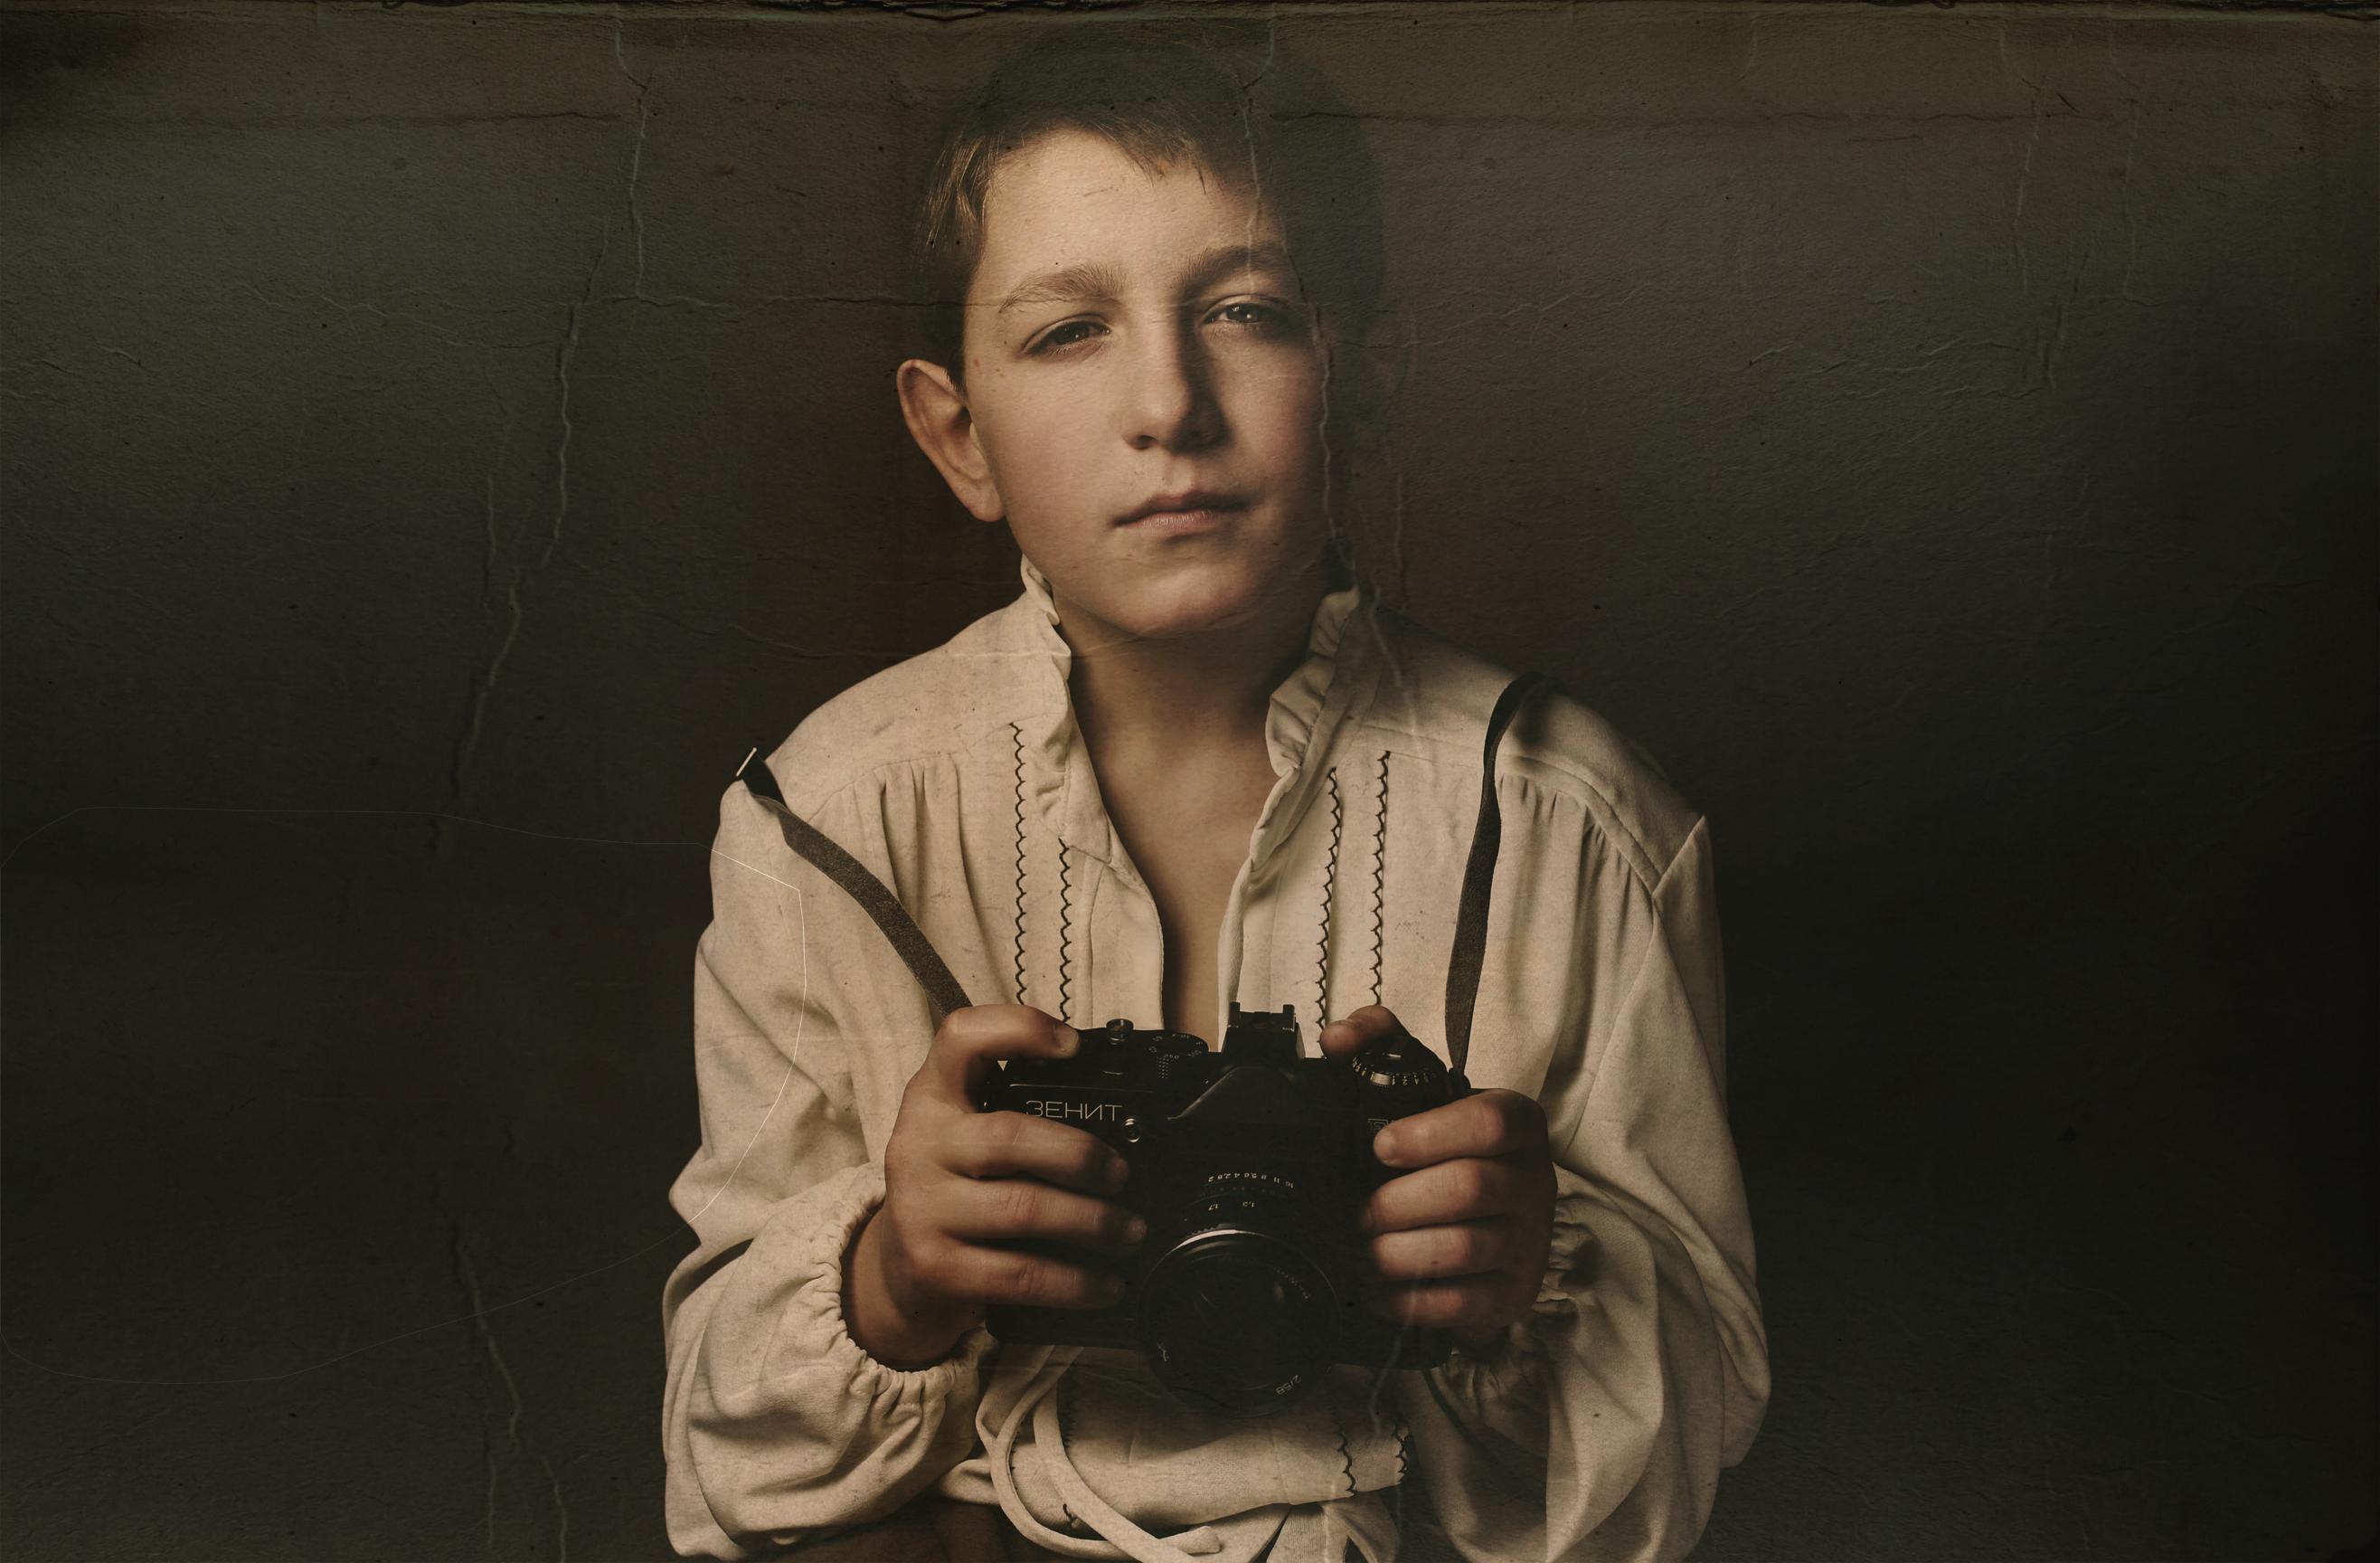 Обои: Селфи молодого фотографа с ...